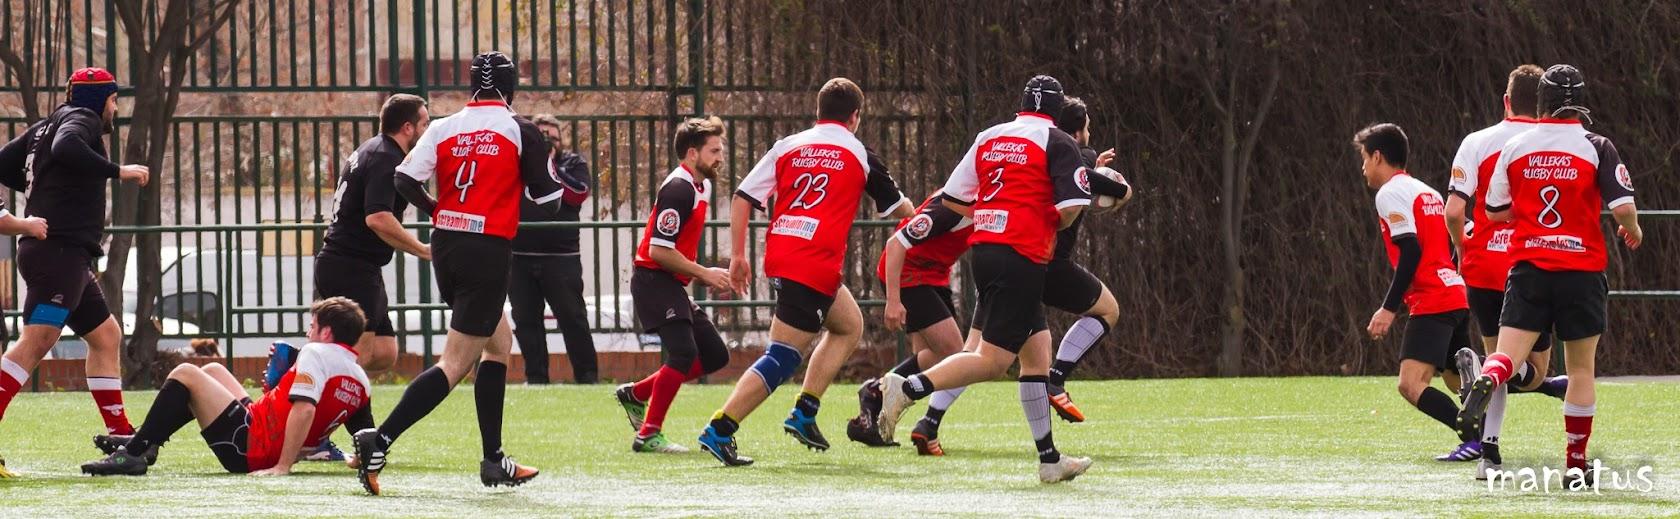 manatus rugby vallecas